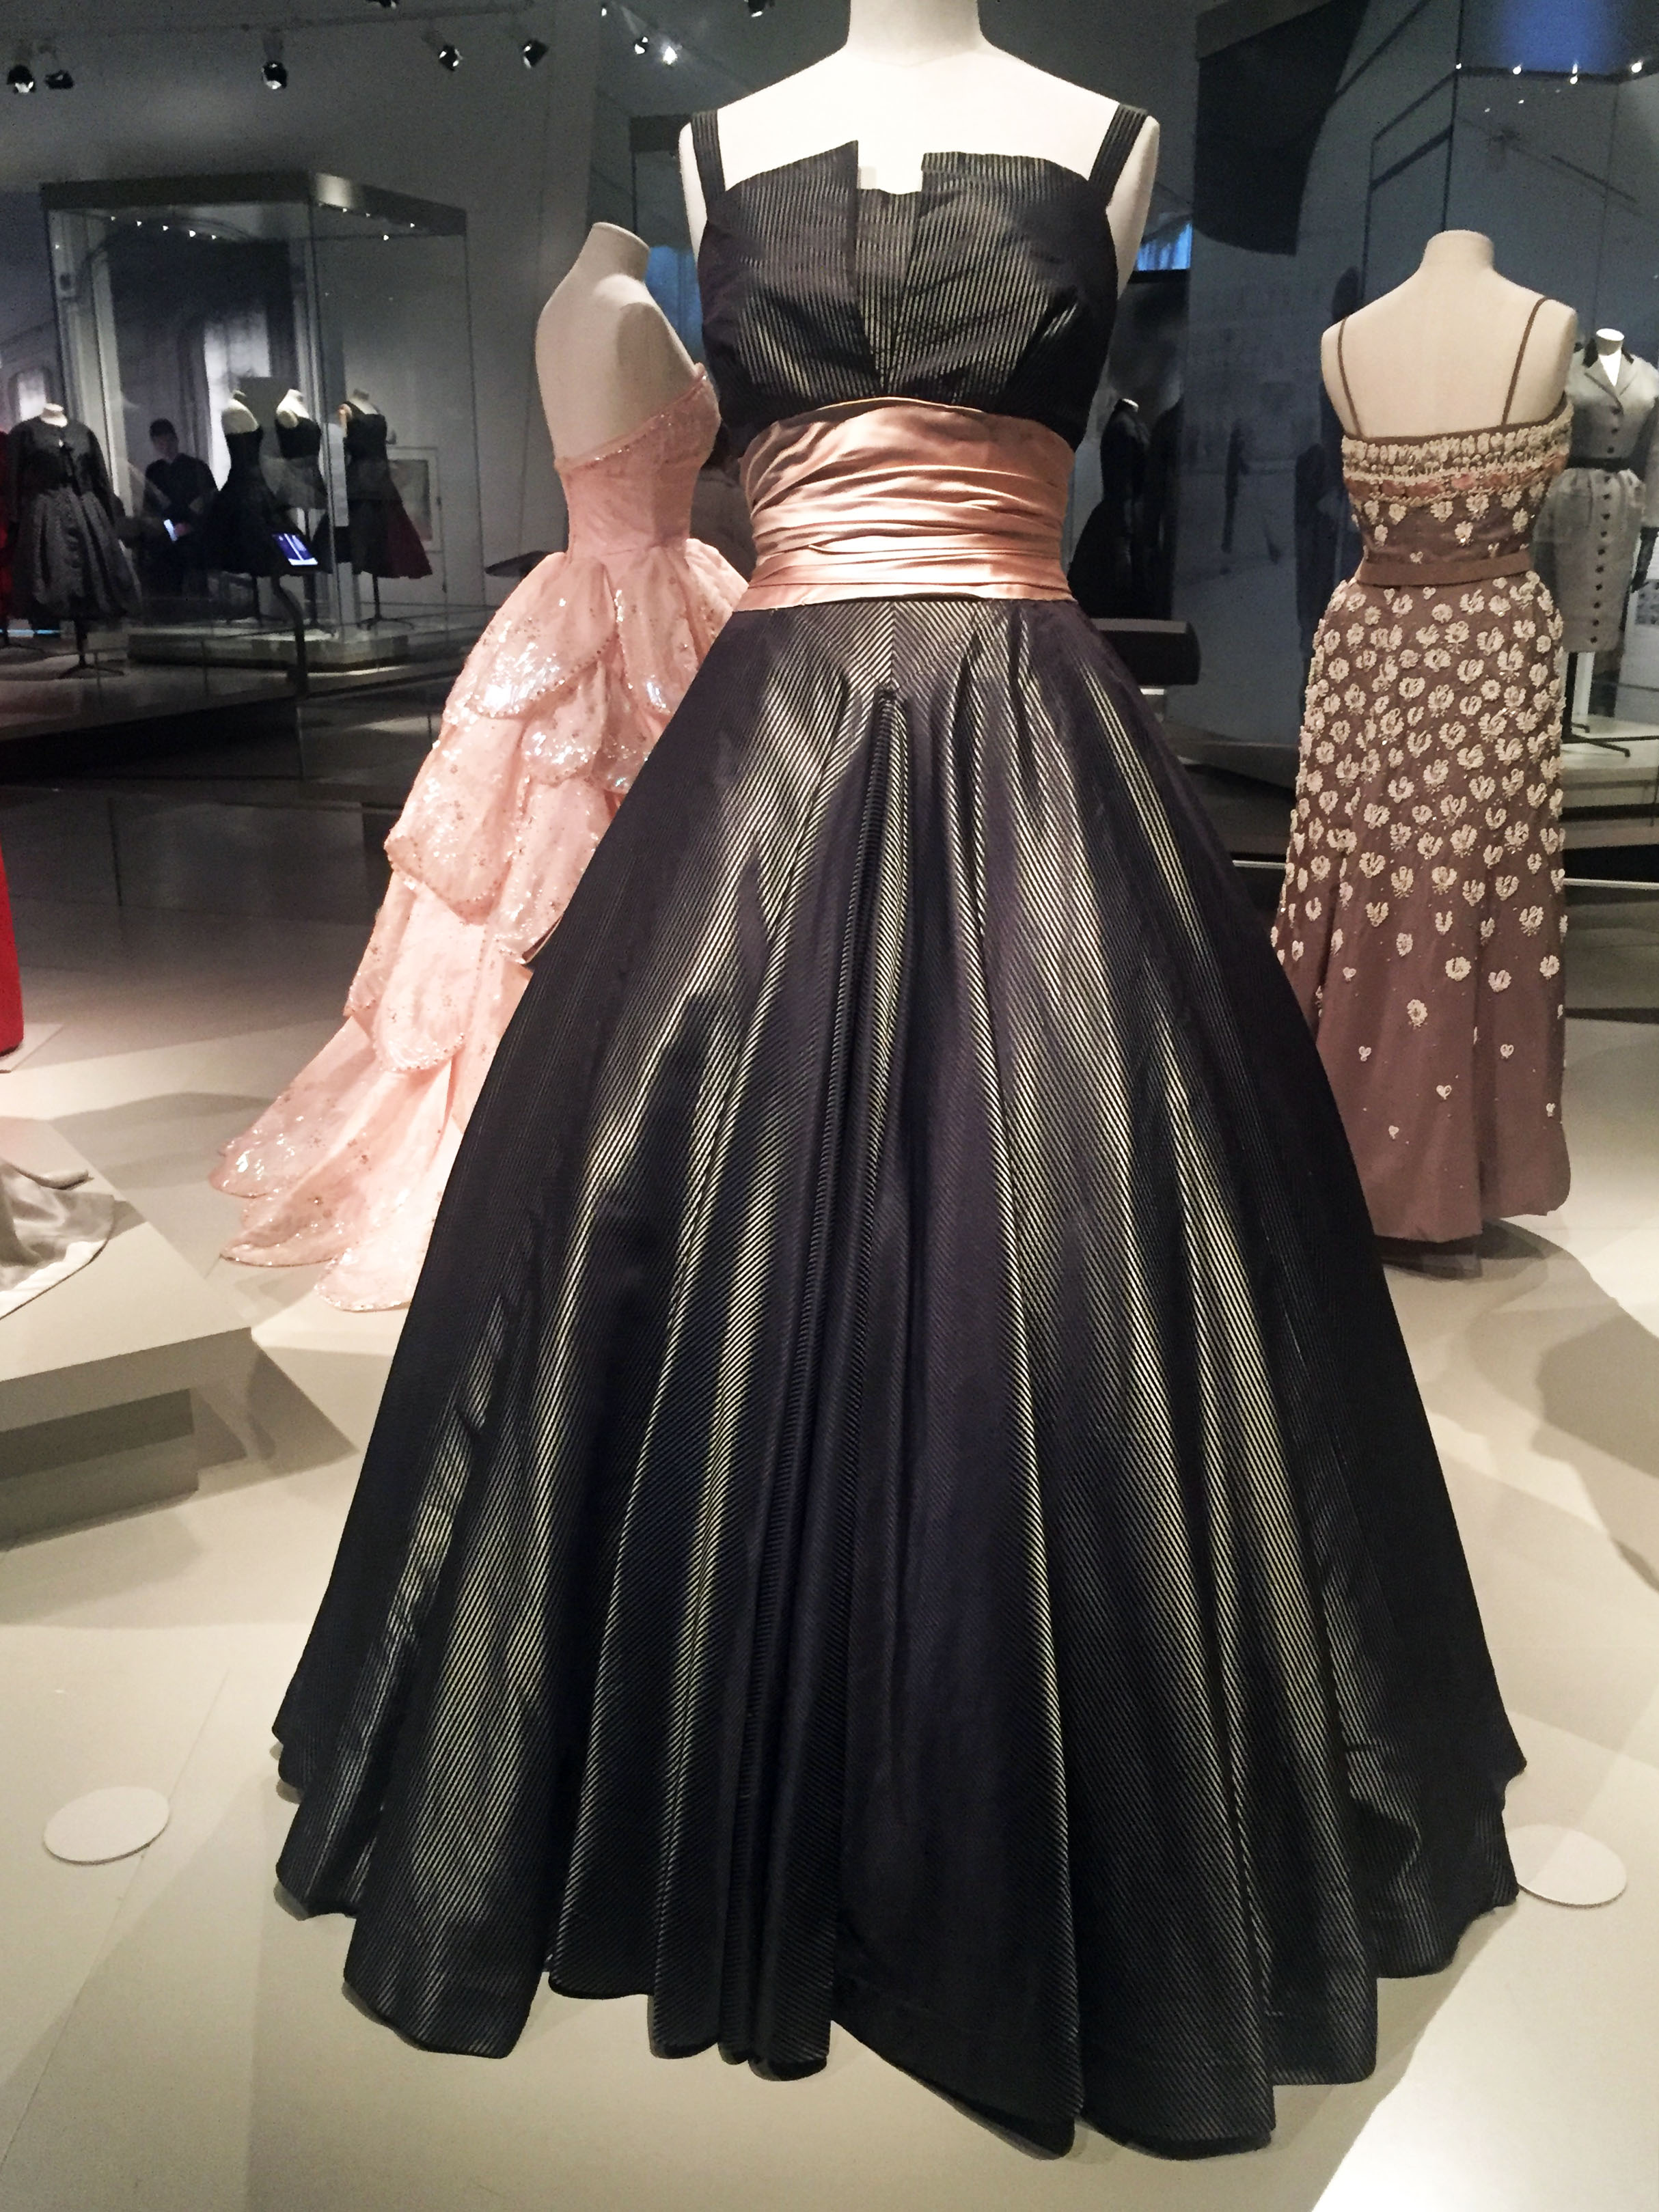 Dior Striped Dress with Pink Ribbon.jpg